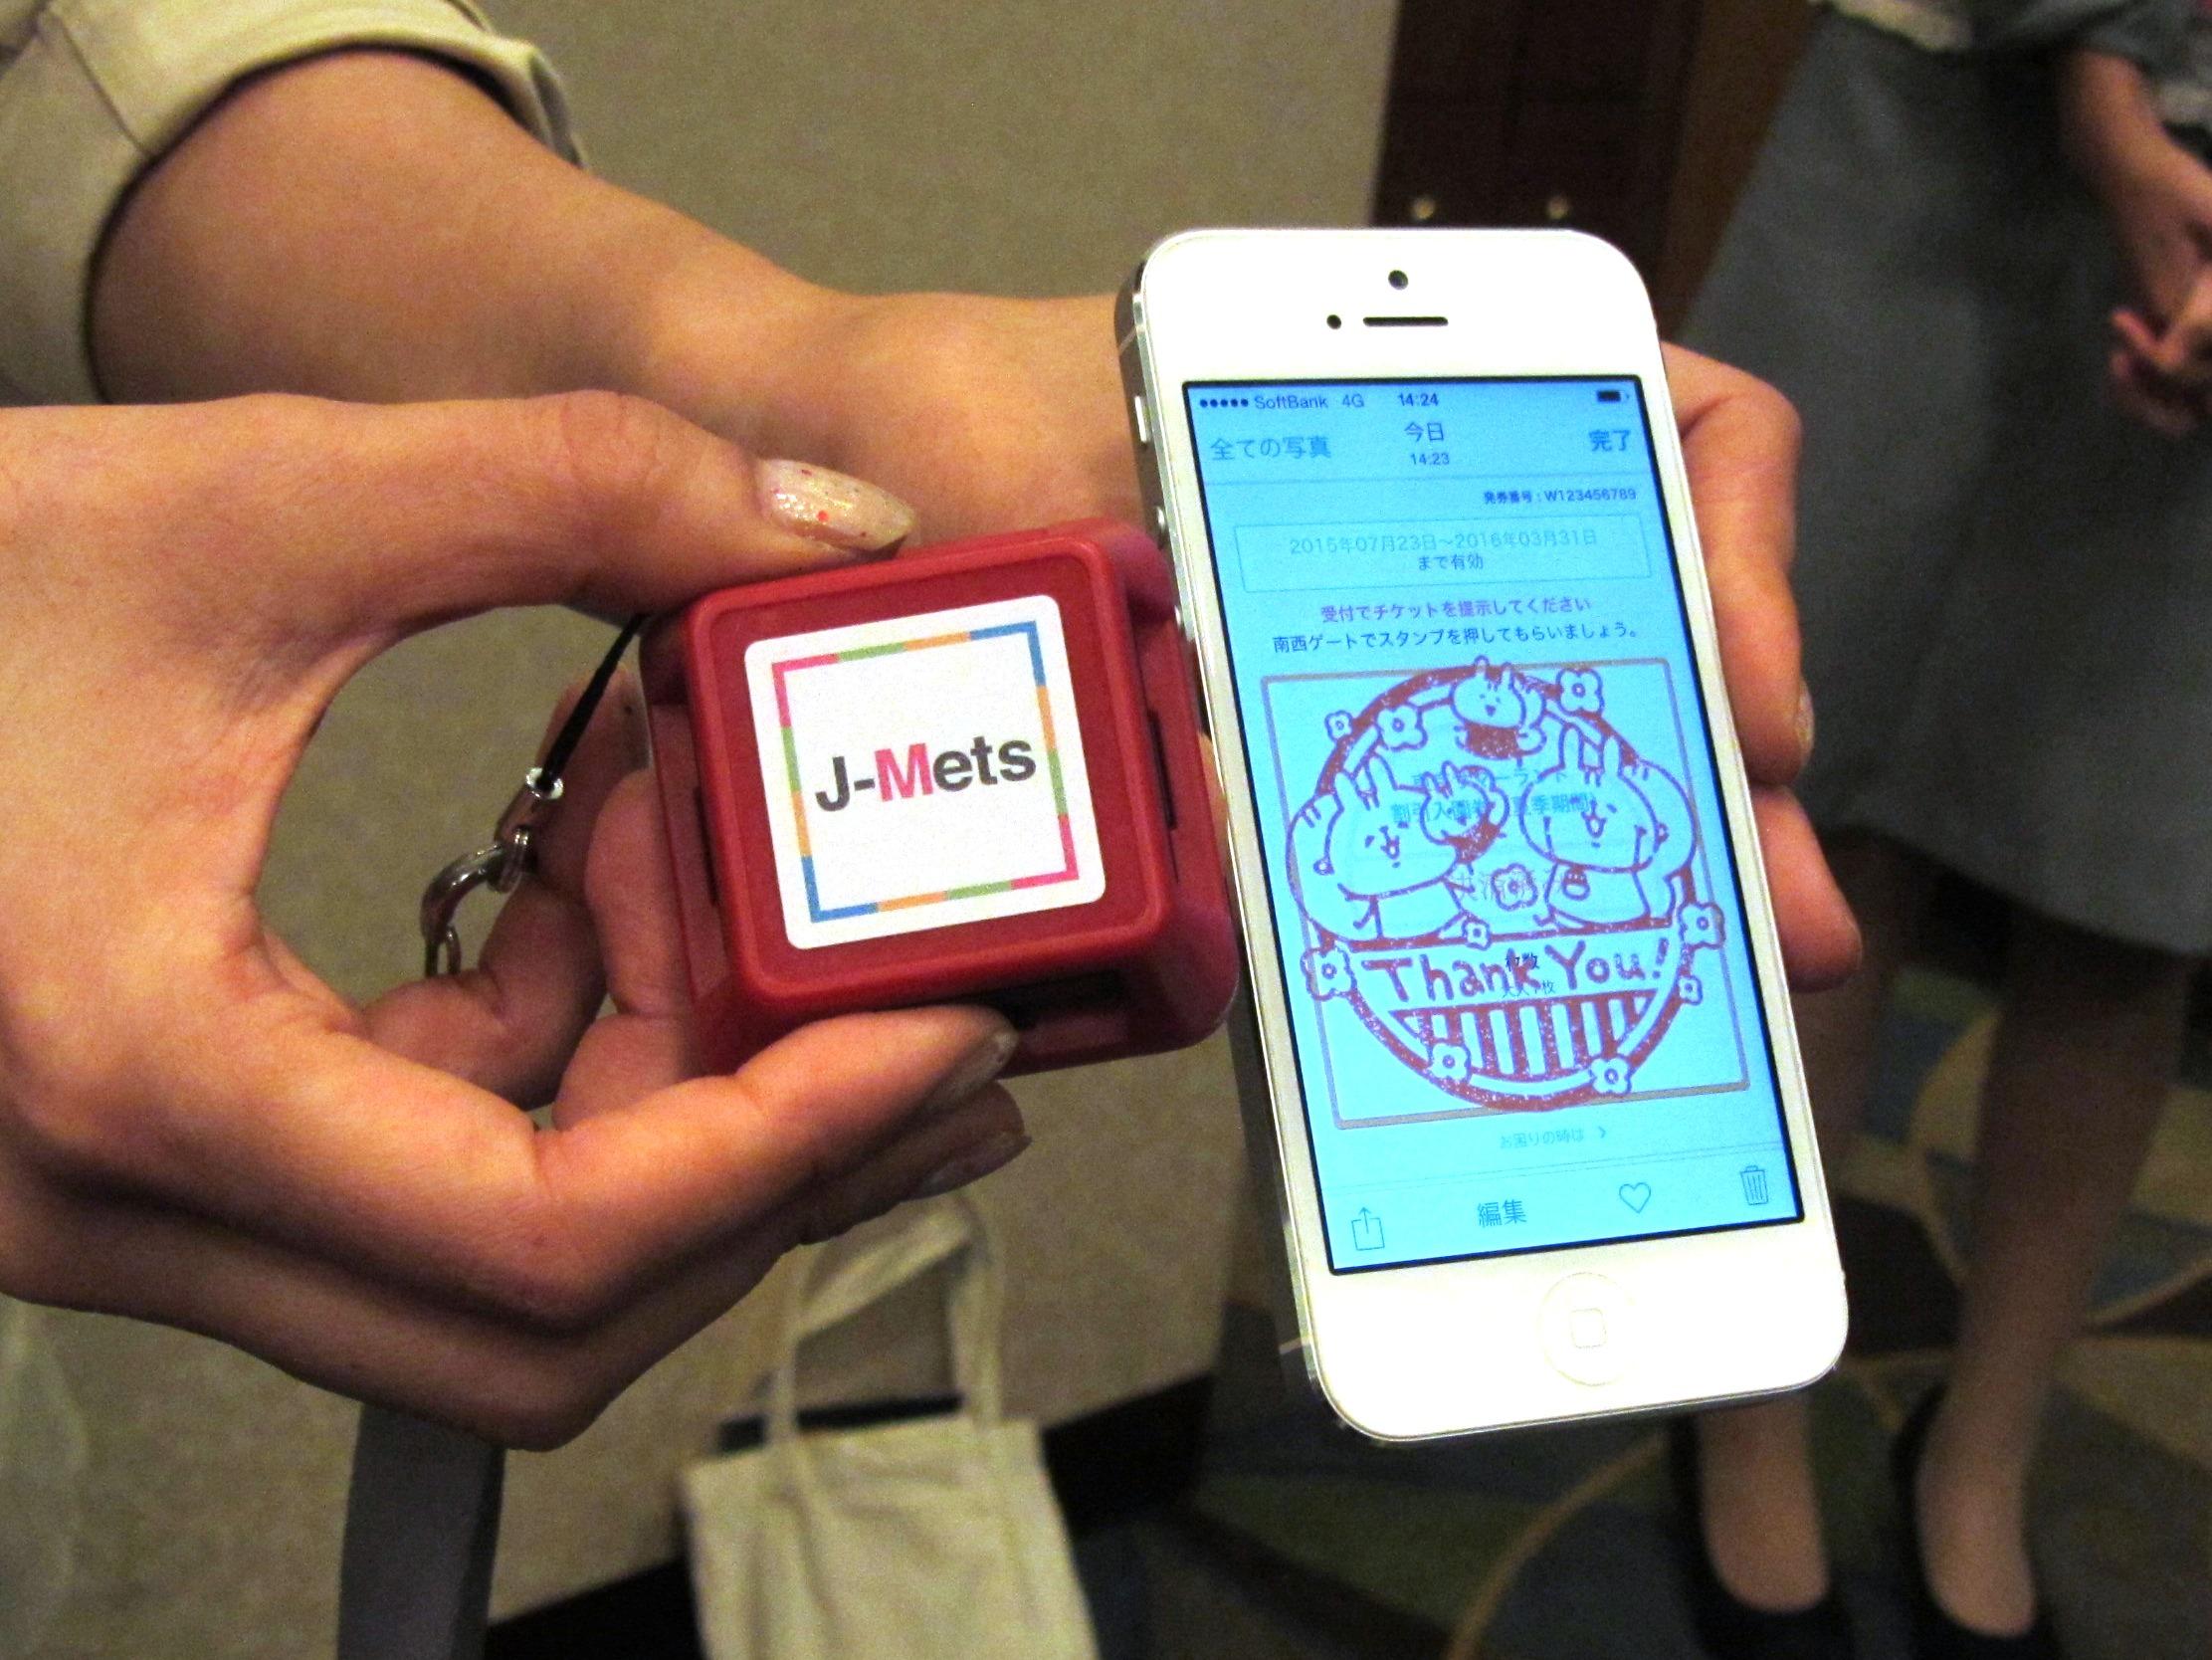 JTB、スマホで入場できる電子チケットのサービス開始、認証と消込機能は「電子スタンプ」で